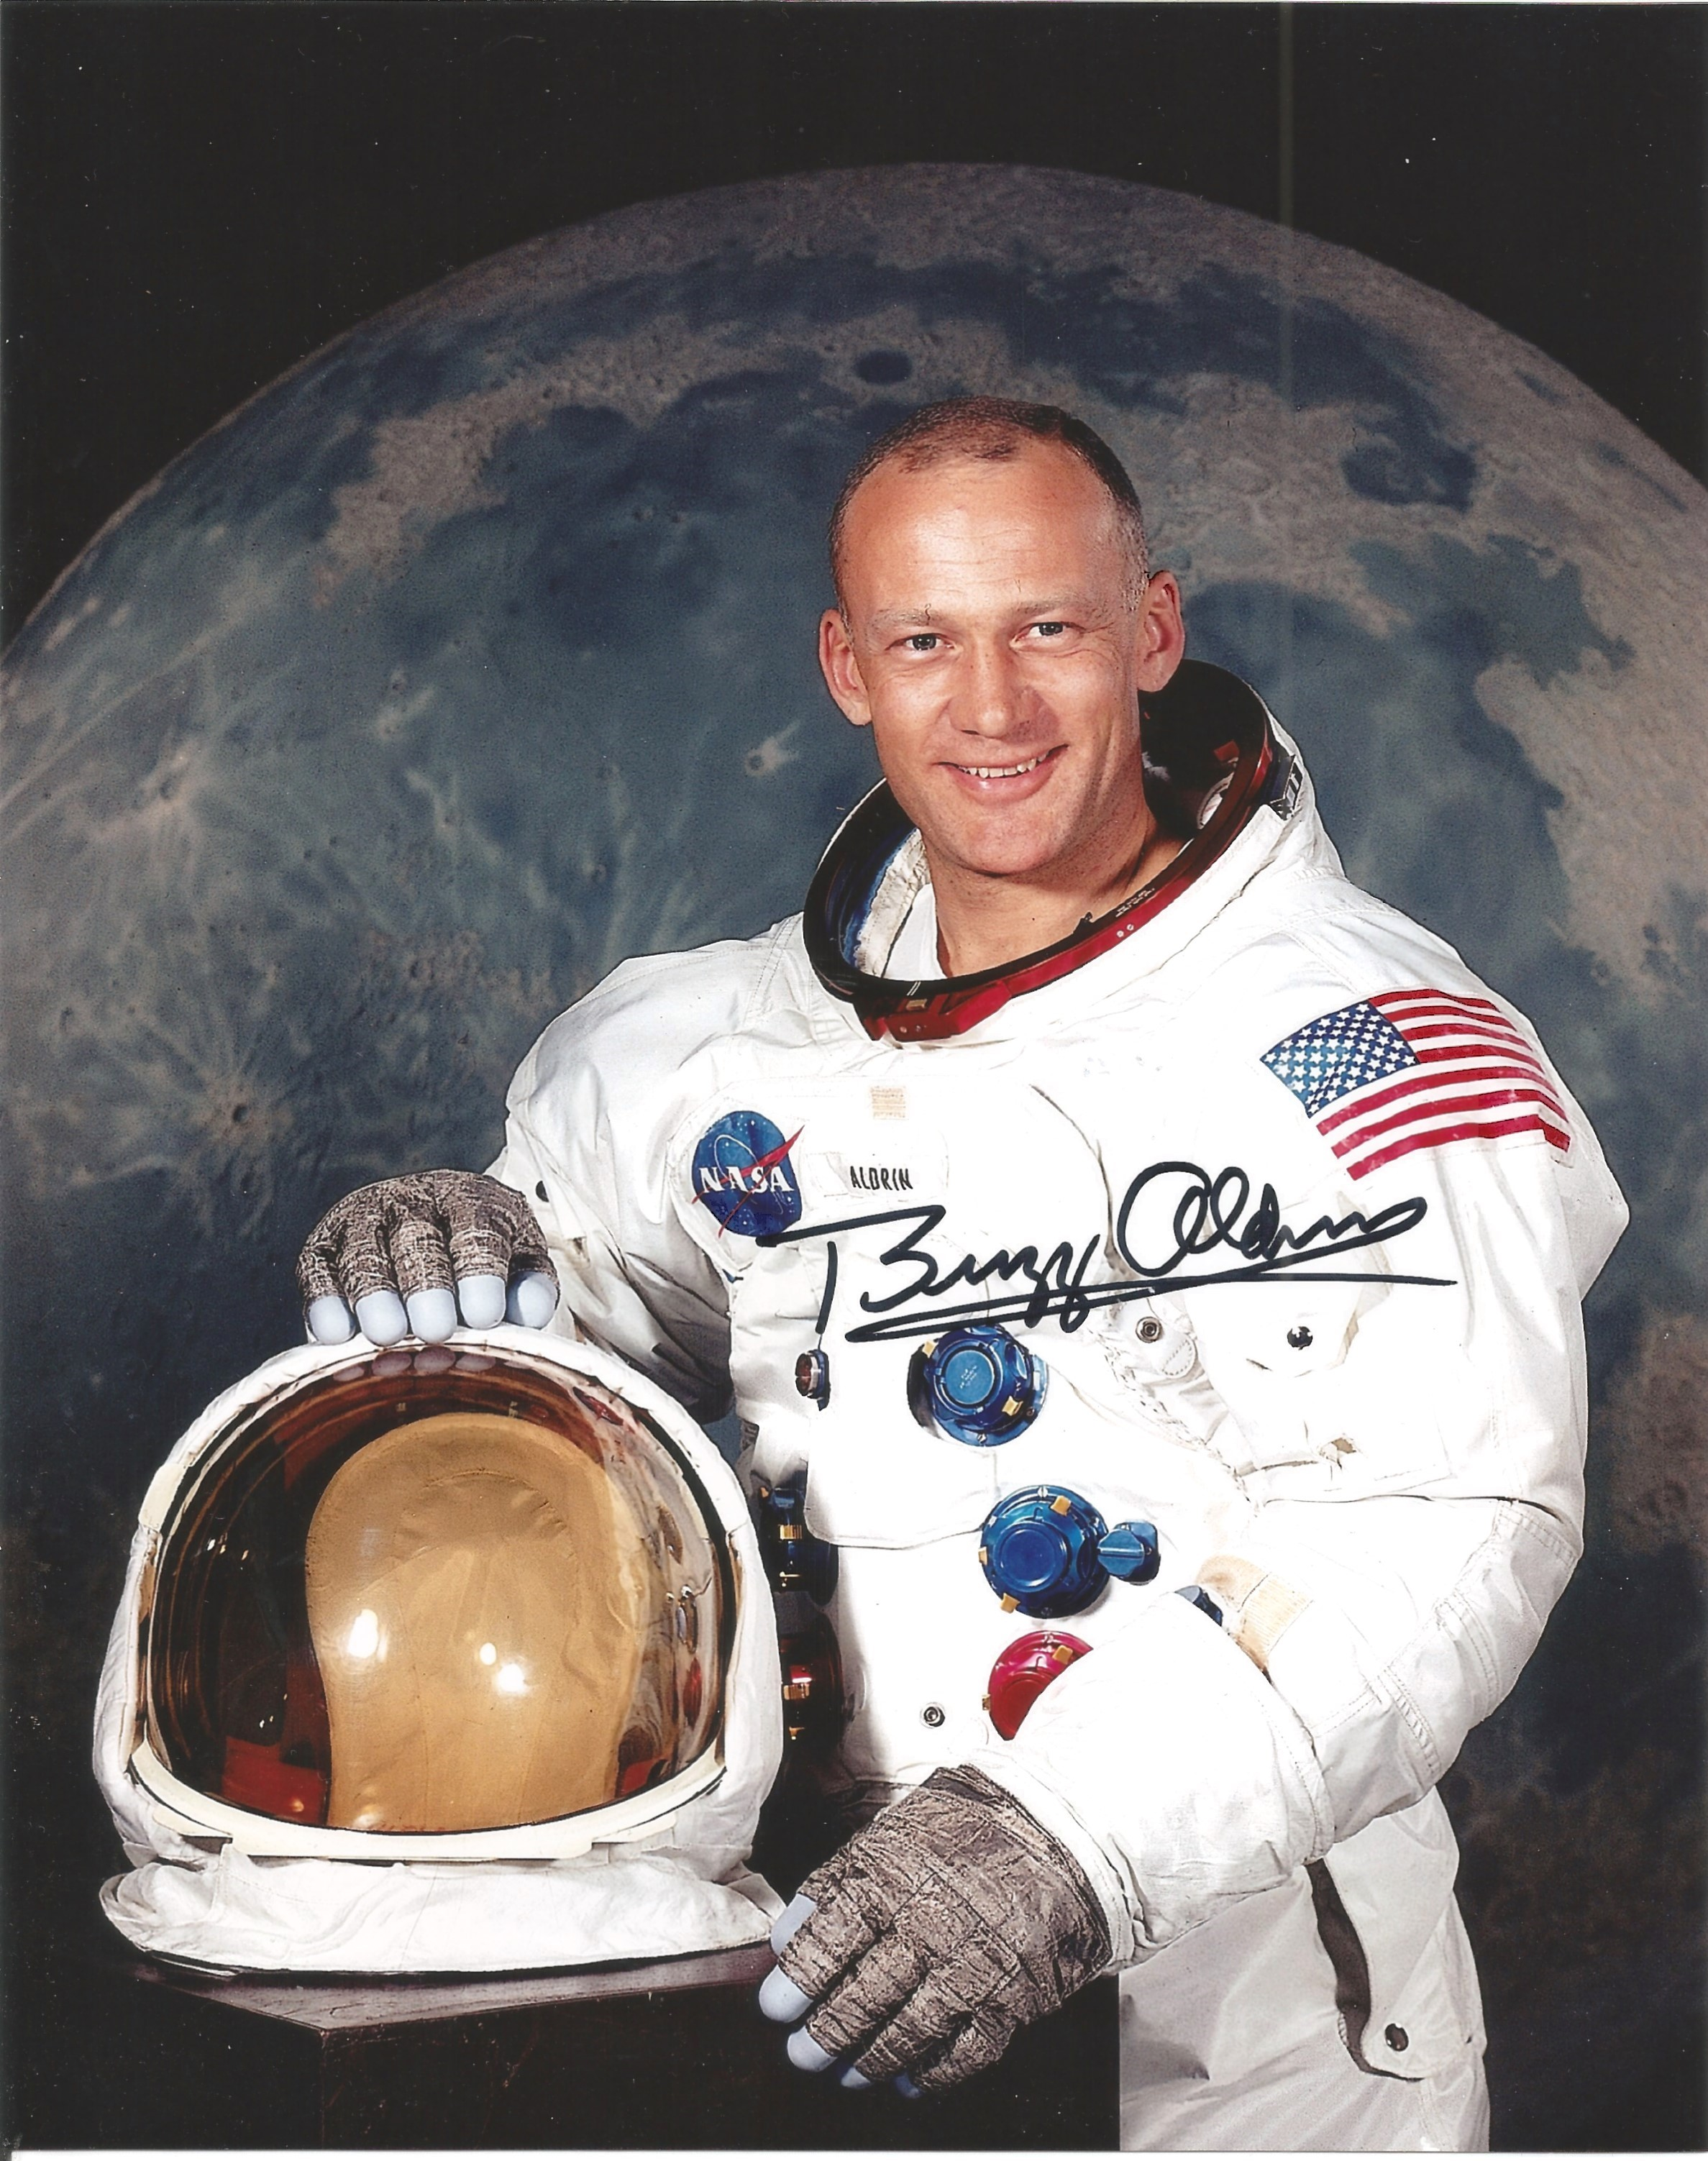 Buzz Aldrin Apollo 11 astronaut signed 10 x 8 inch colour white space suit photo. Good condition.